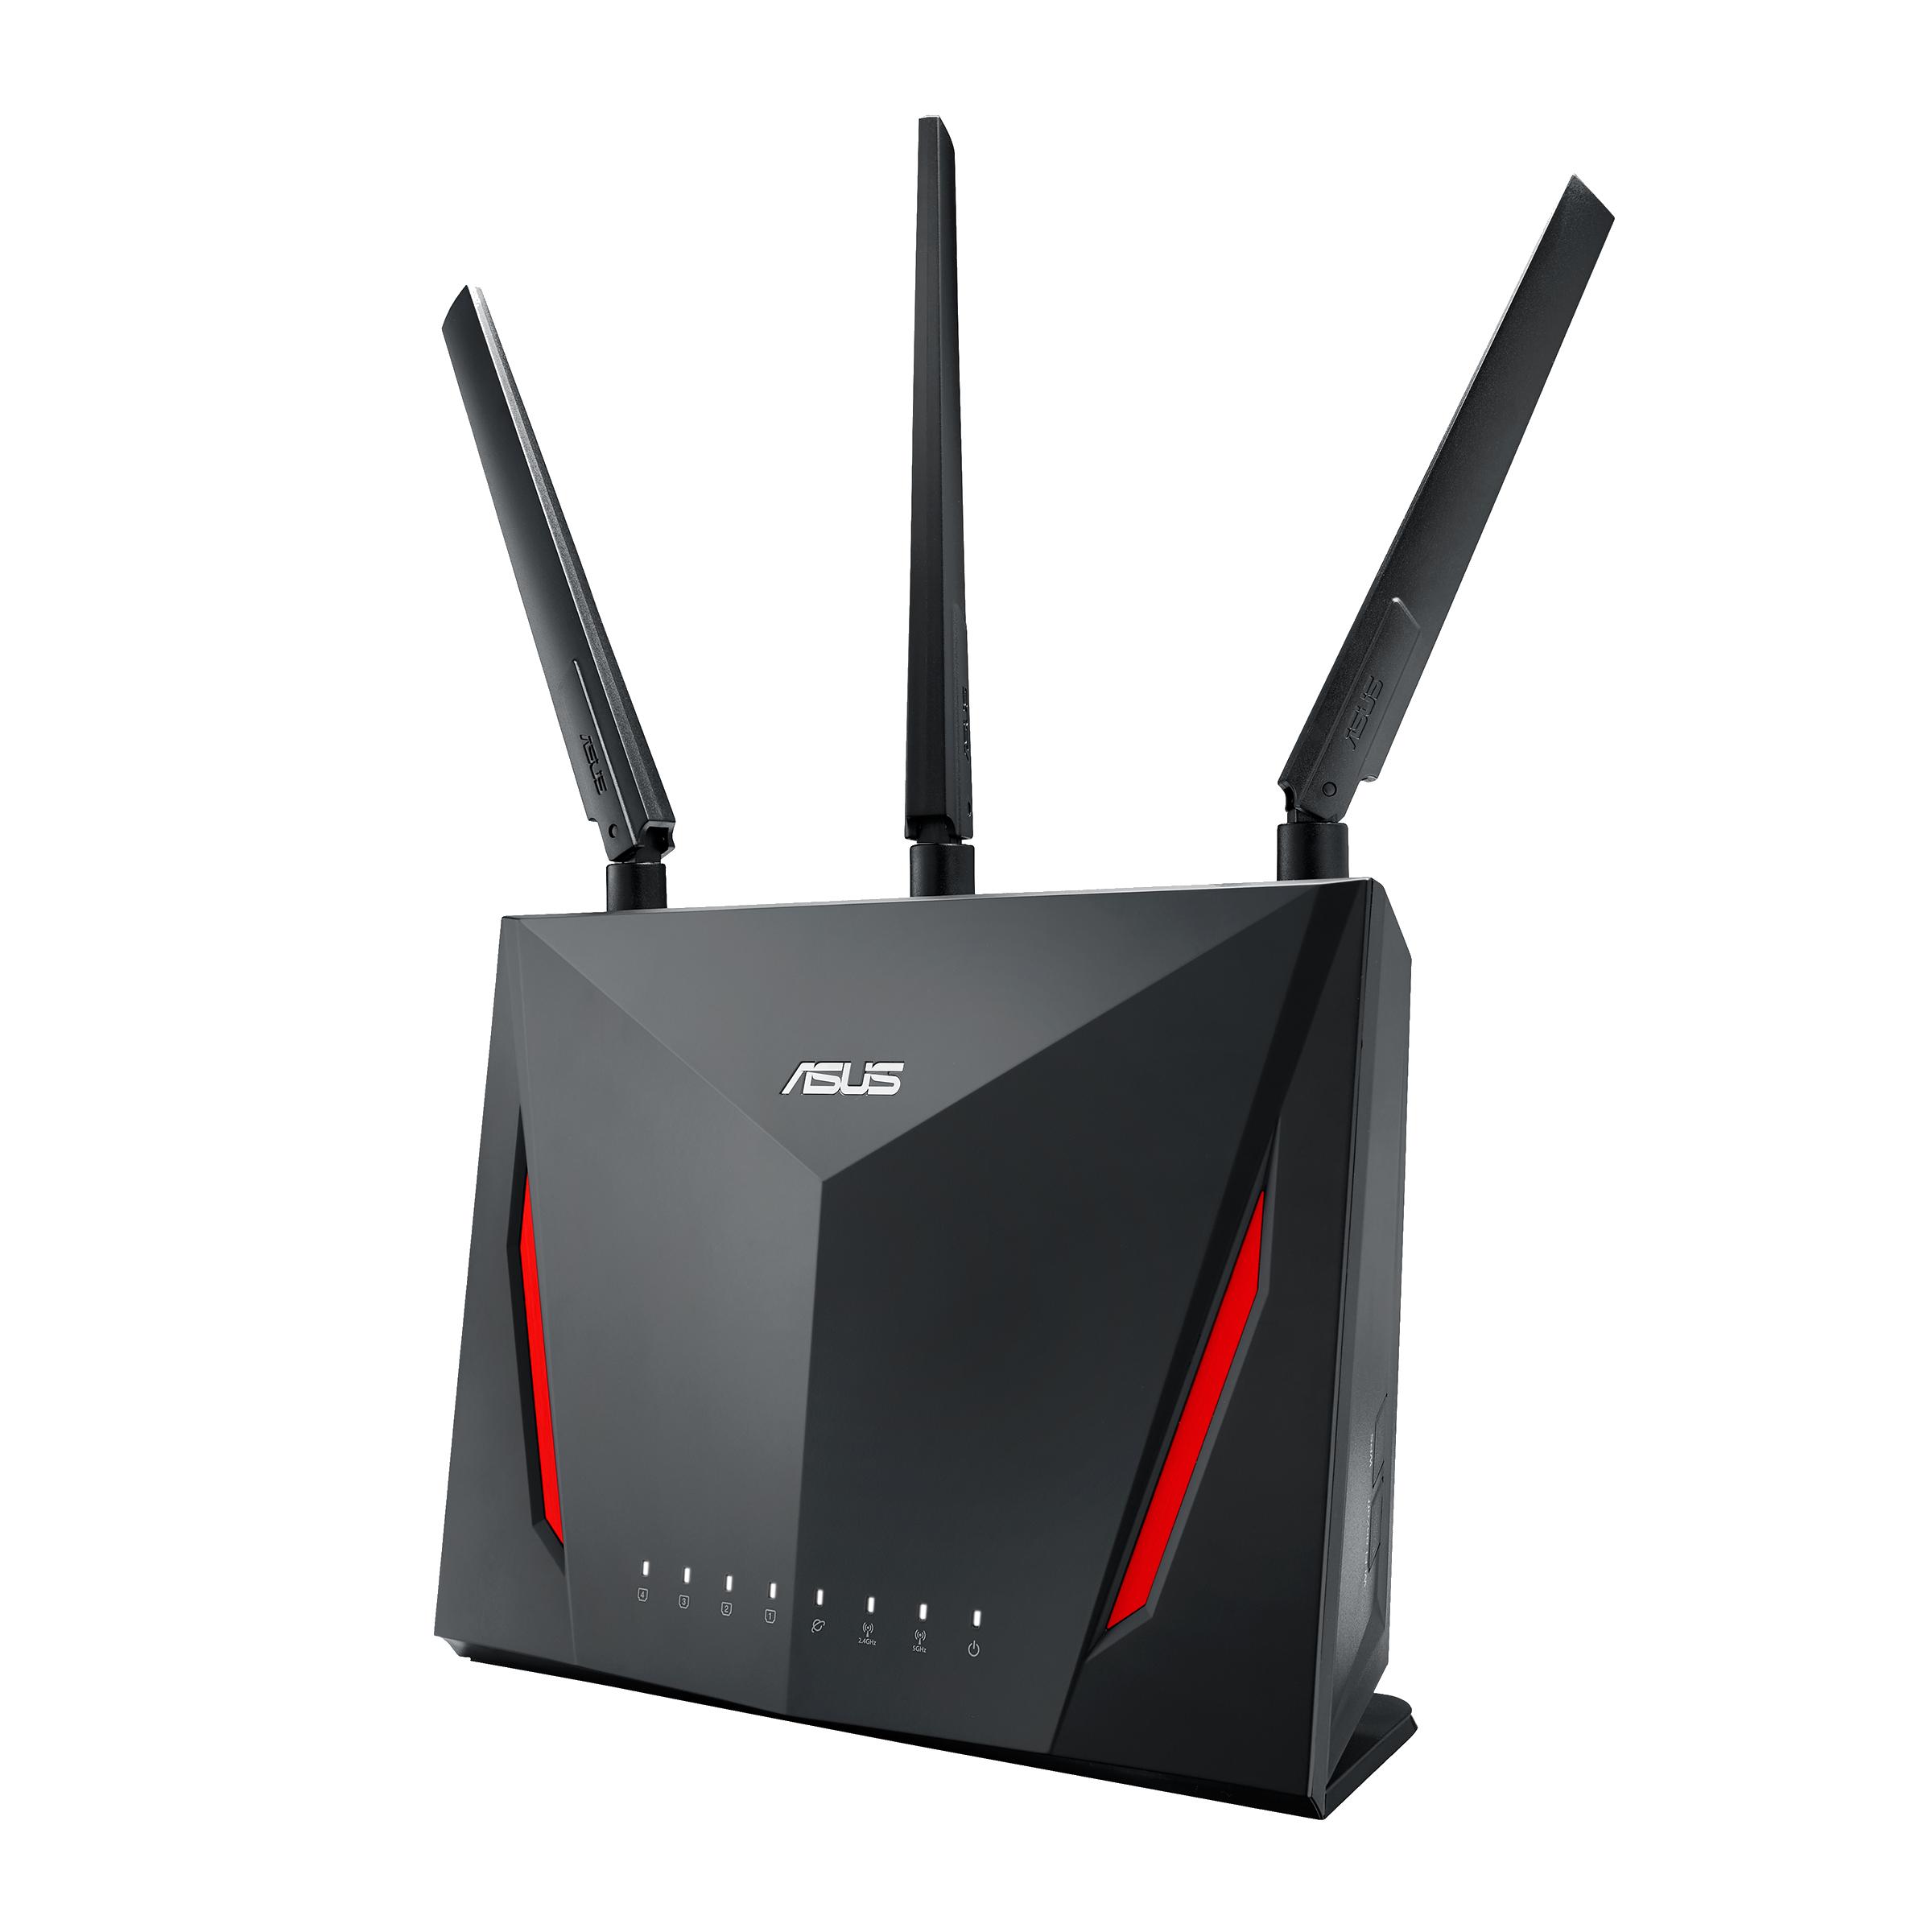 [Prime] Routeur Asus RT-AC86U Wi-Fi Ai mesh / AC 2900 Mbps Double Bande MU-MIMO (Via ODR de 40€)